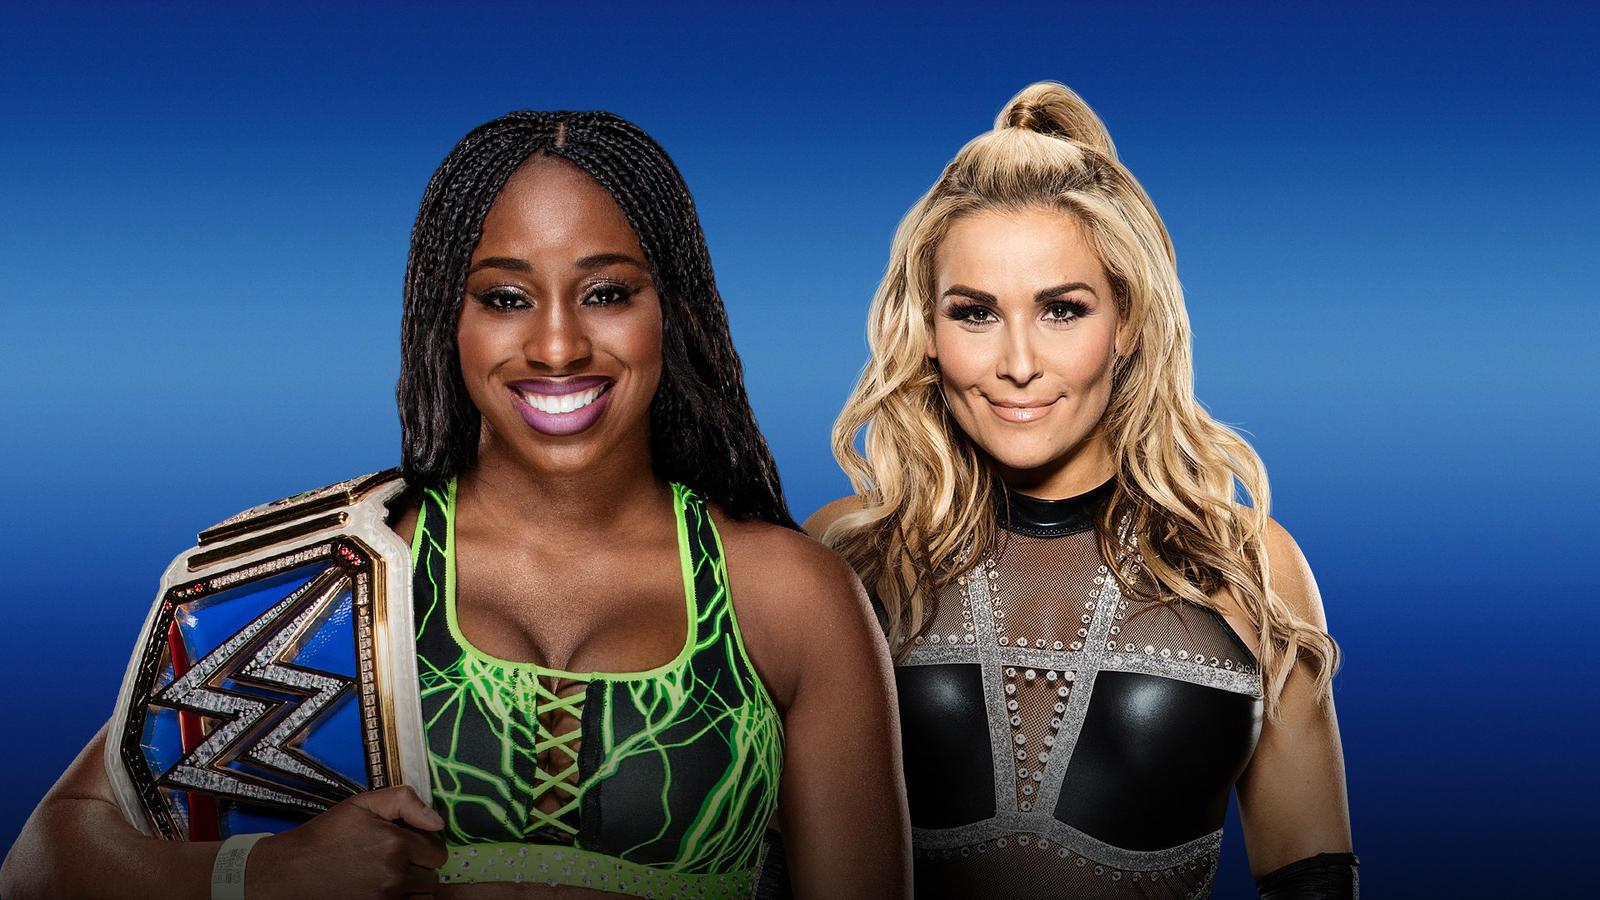 WWE SummerSlam 2017 Live Stream